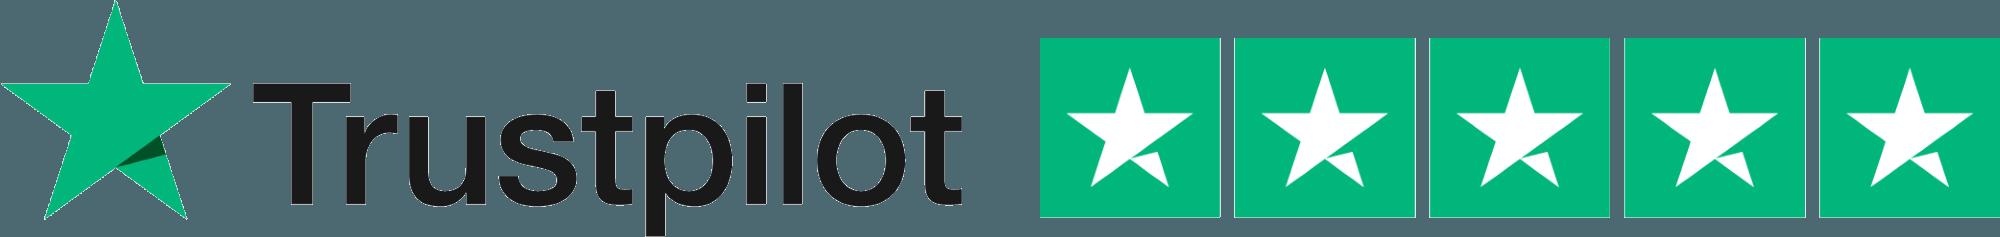 trustpilot-logo-stars Invest Preneur Julien Malengo